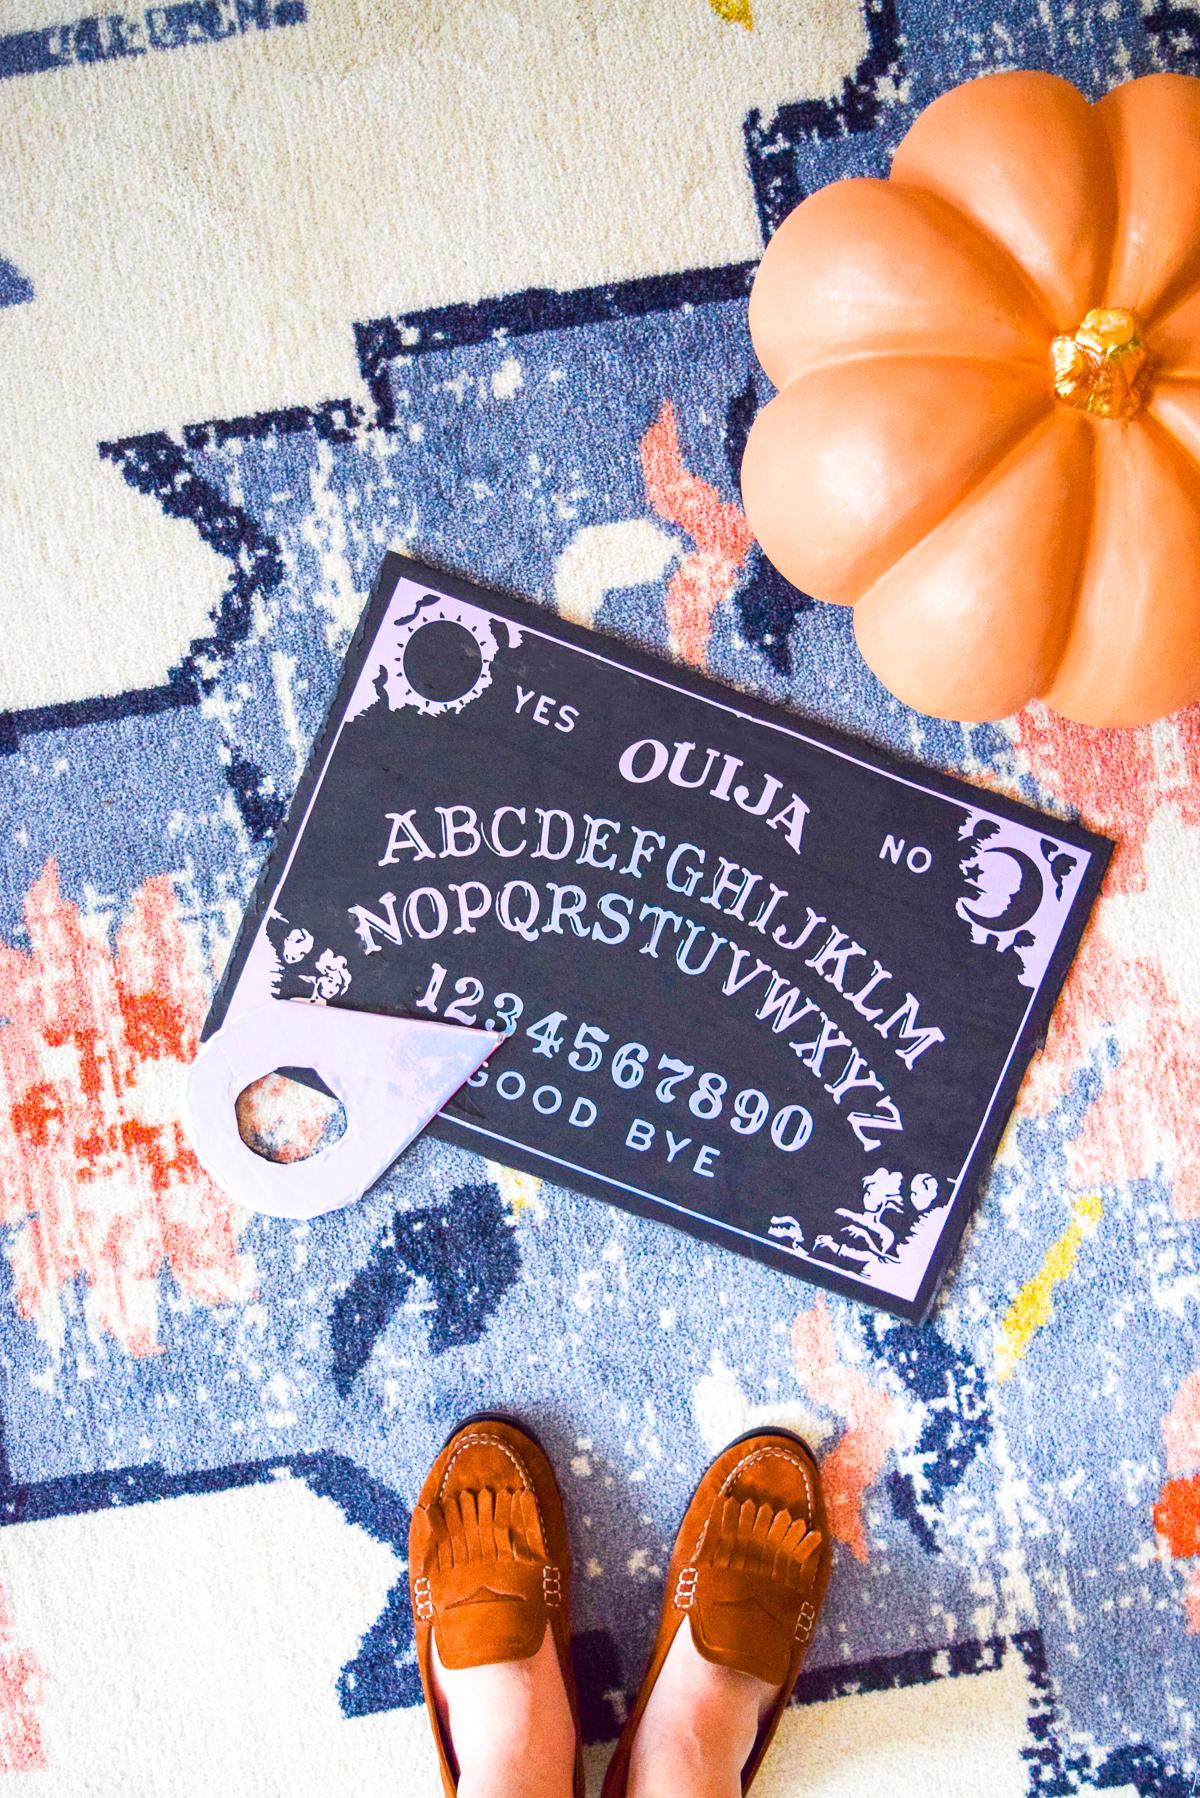 diy holographic ouija board on a carpet near a pumpkin